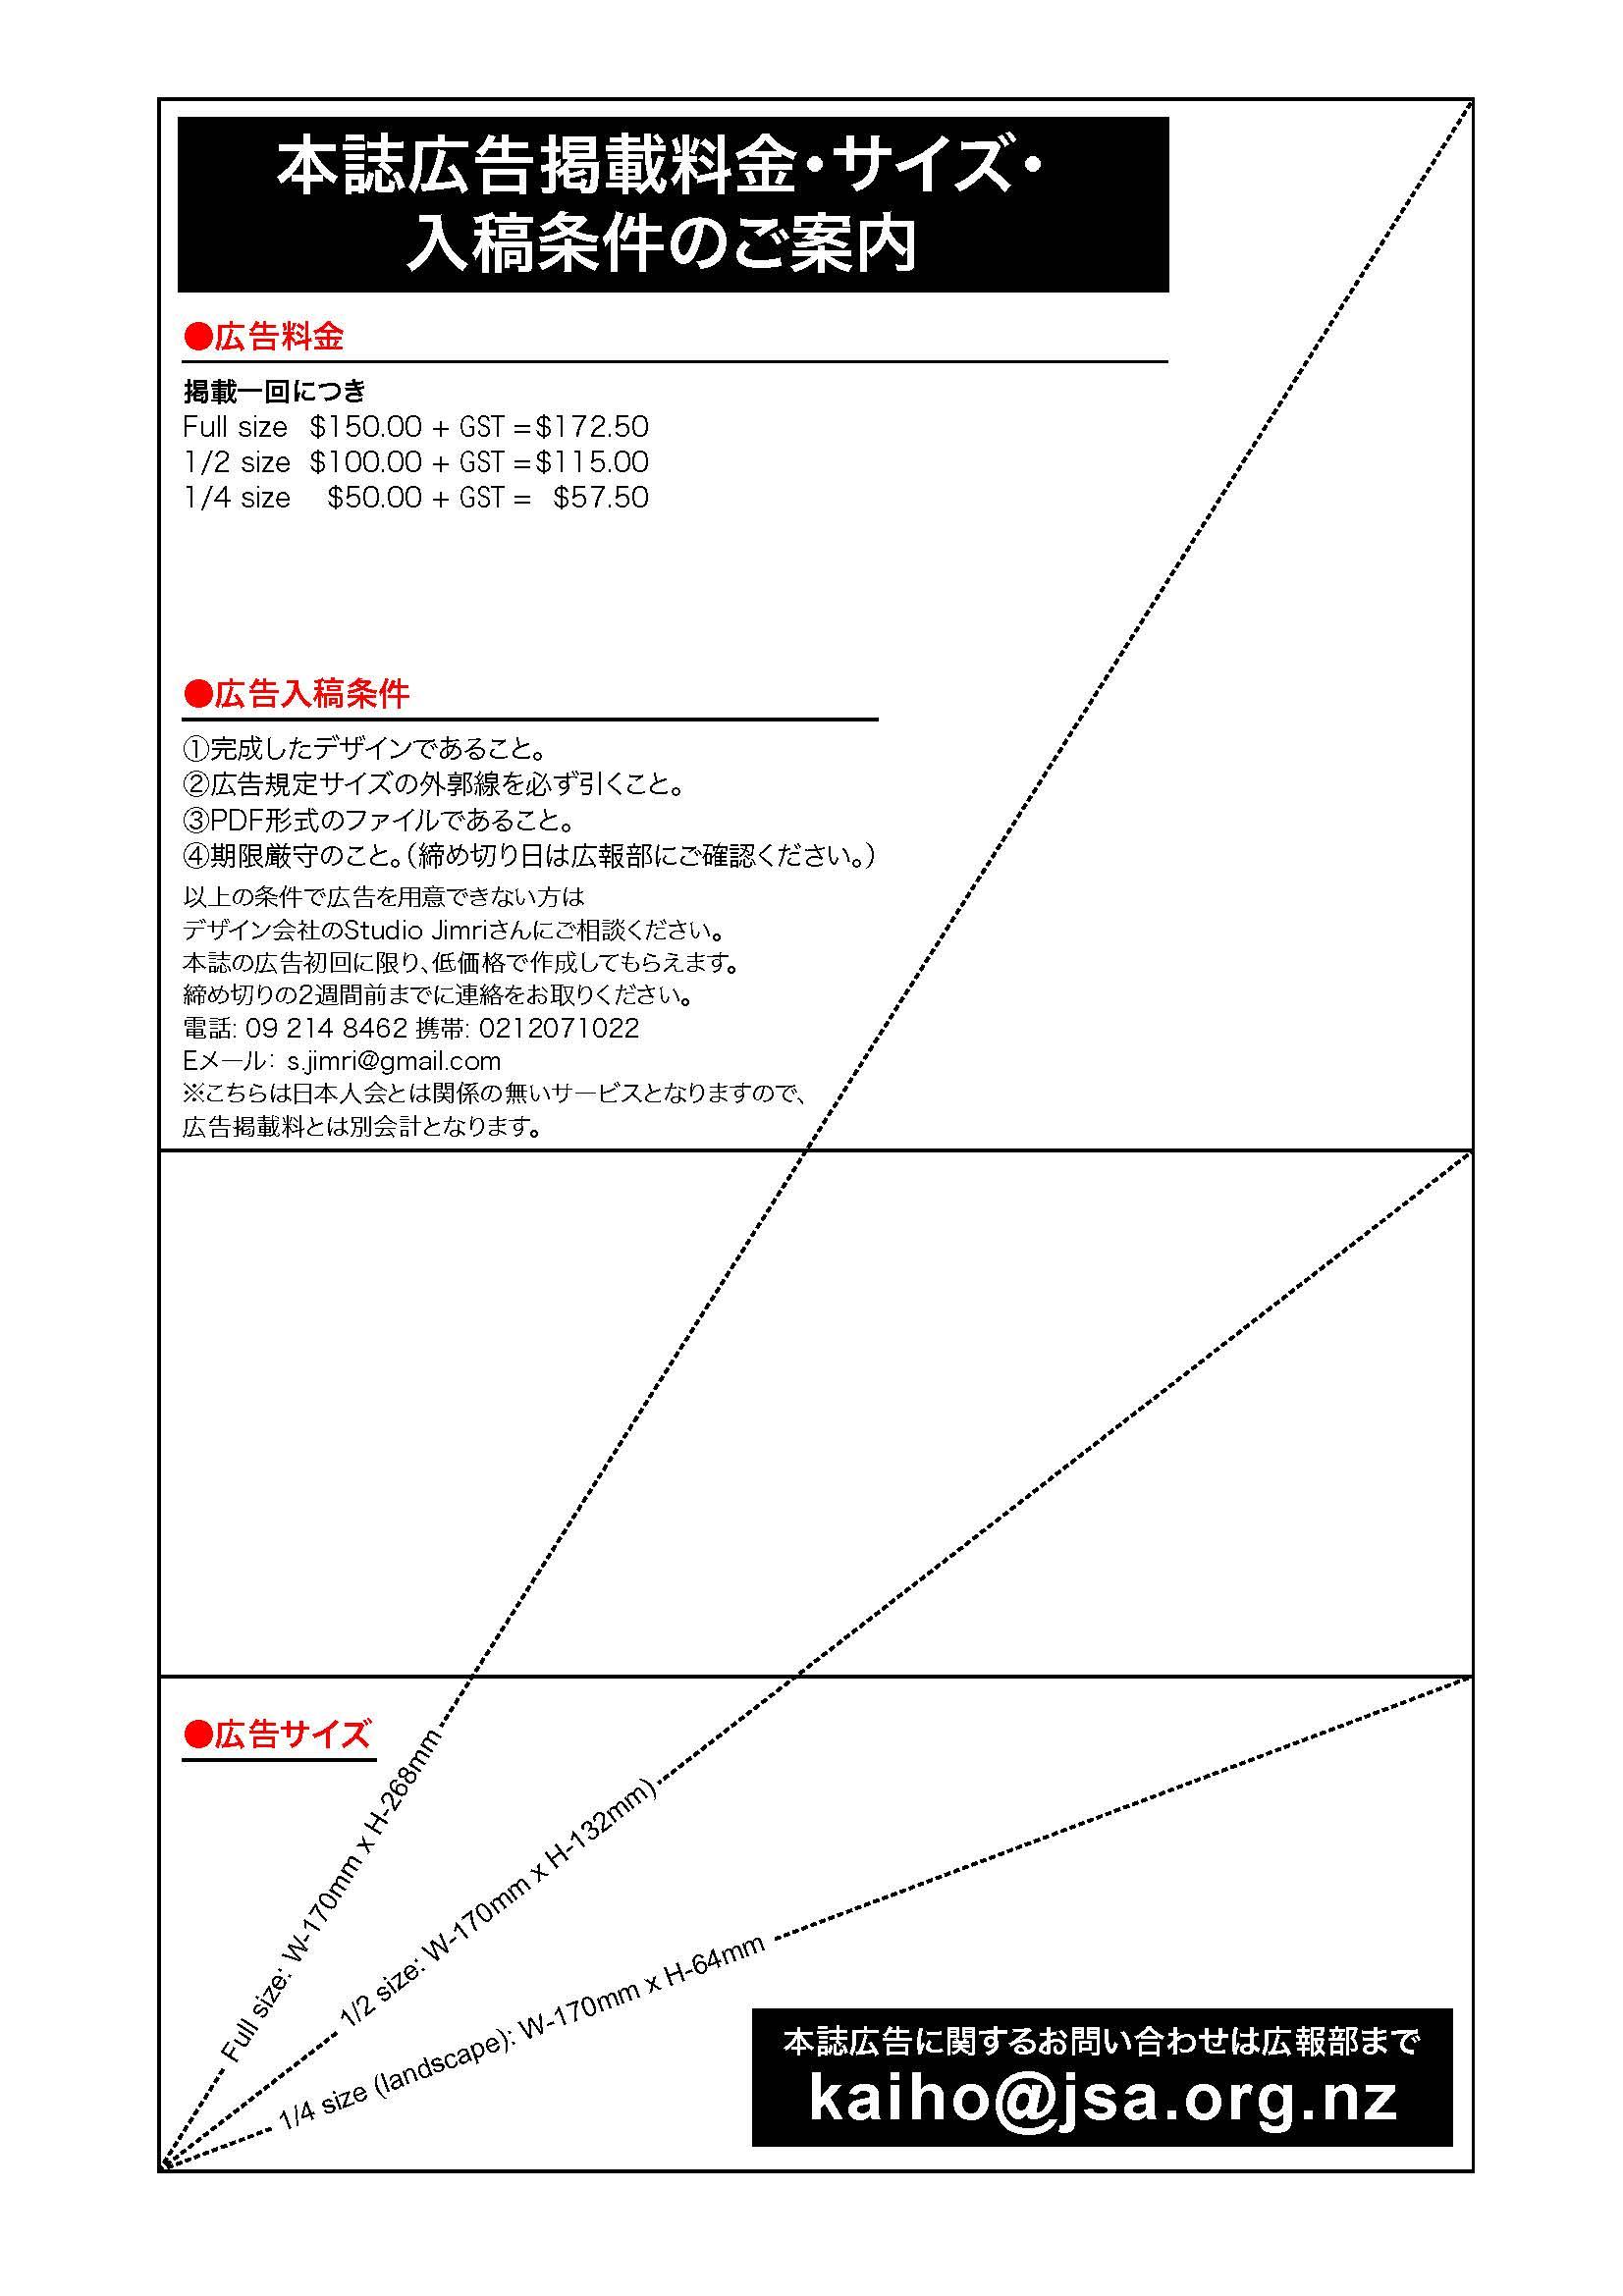 オークランド日本人会会報誌広告掲載料金